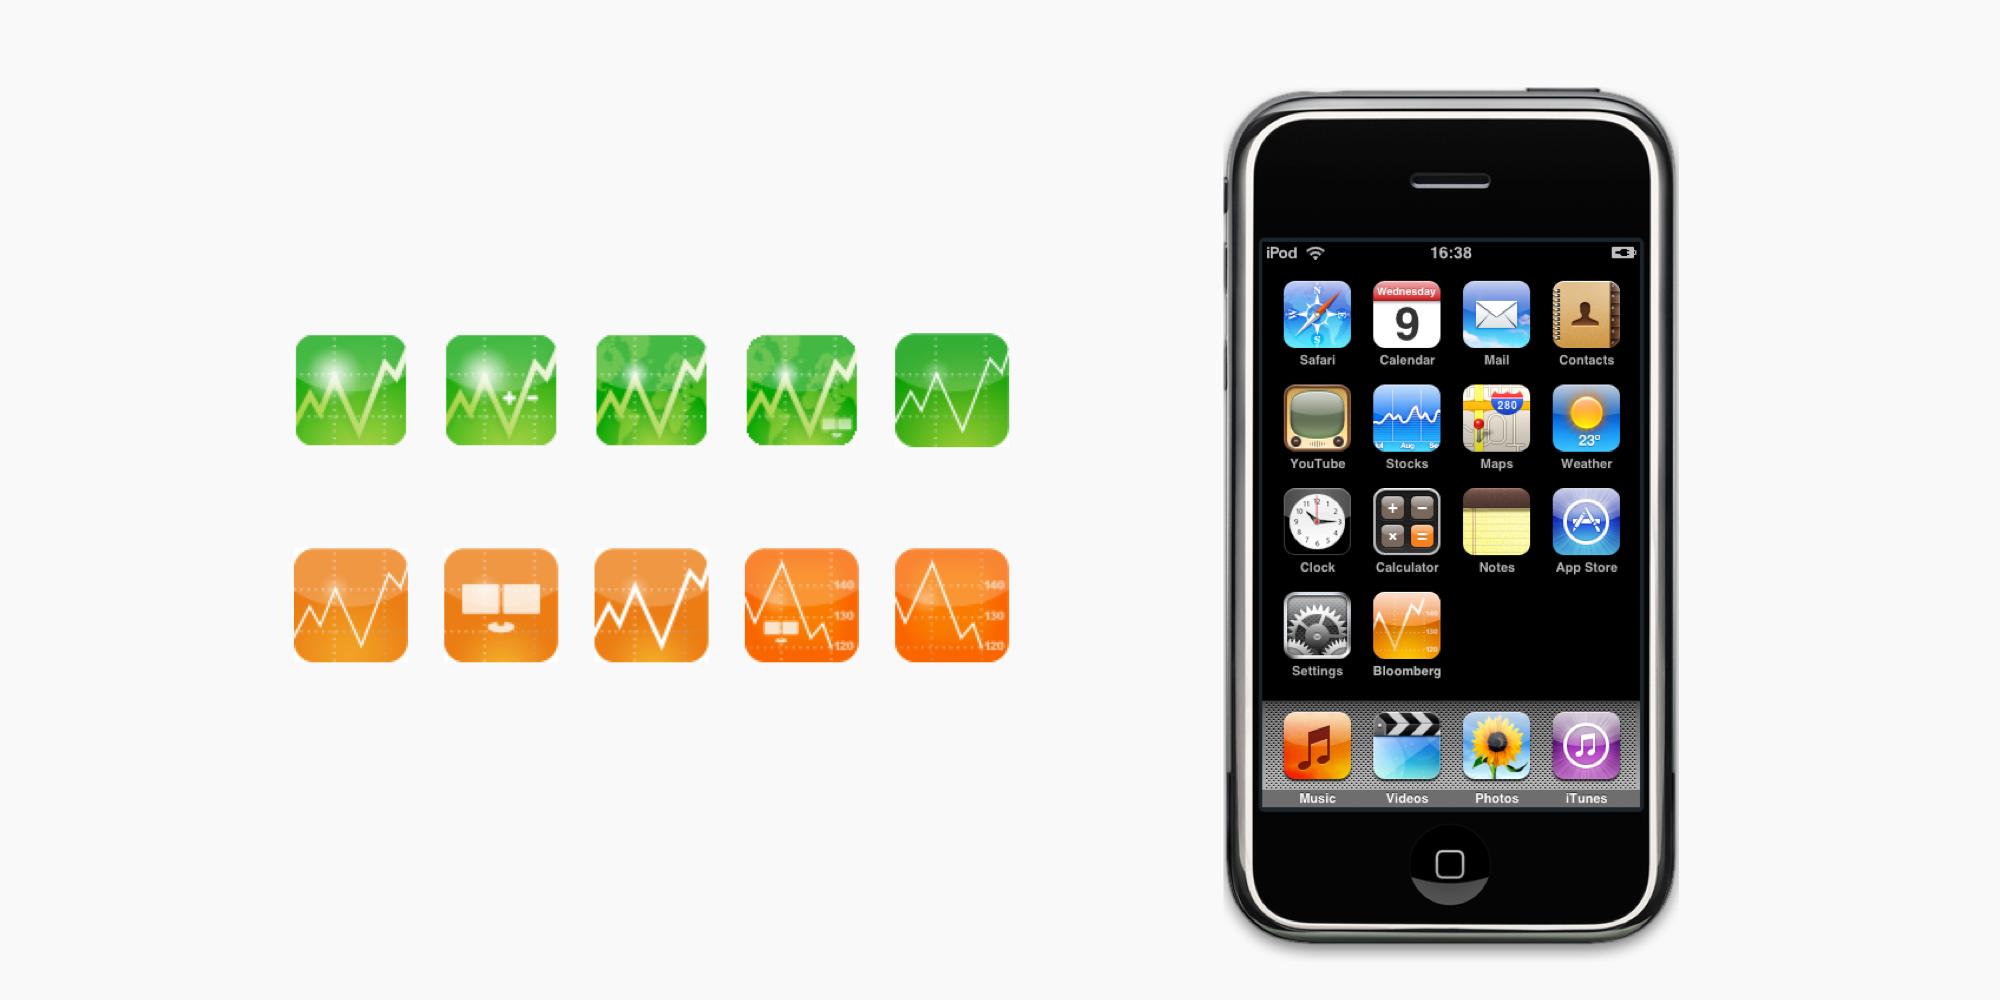 img_app icon versions@2x